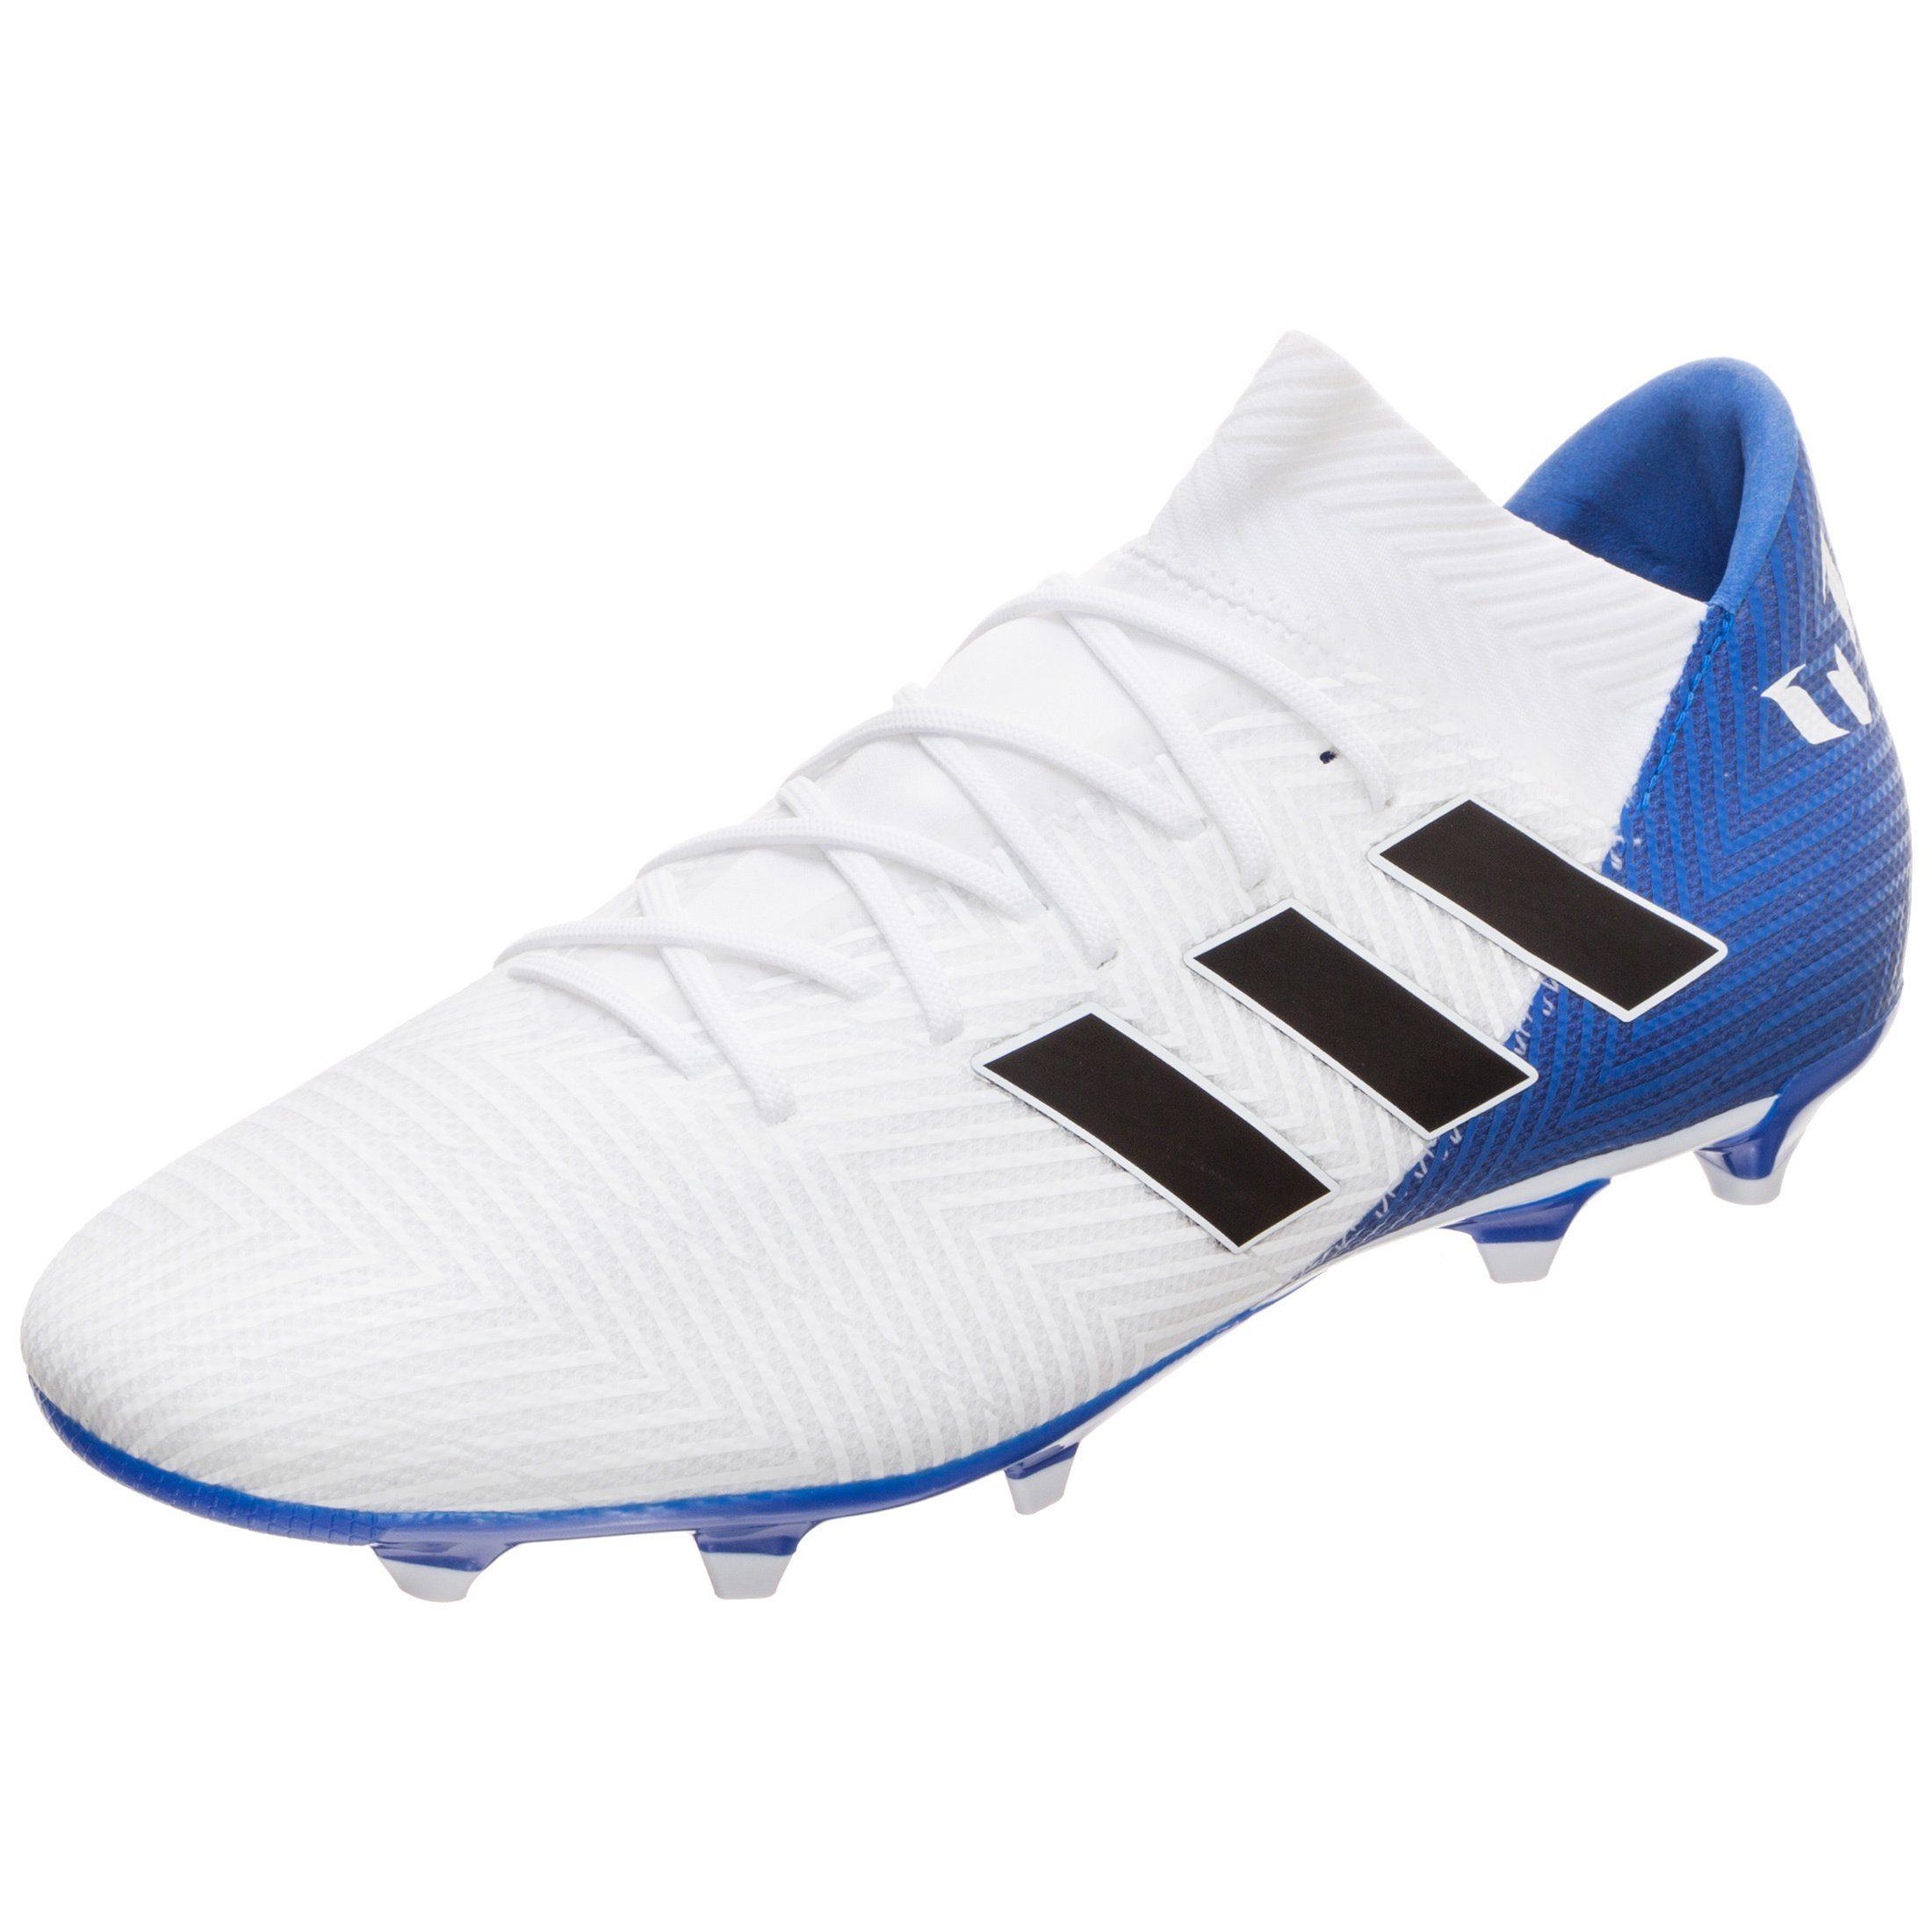 adidas Performance Fußballschuh Nemeziz Messi 183 | Schuhe > Sportschuhe > Fußballschuhe | Adidas Performance